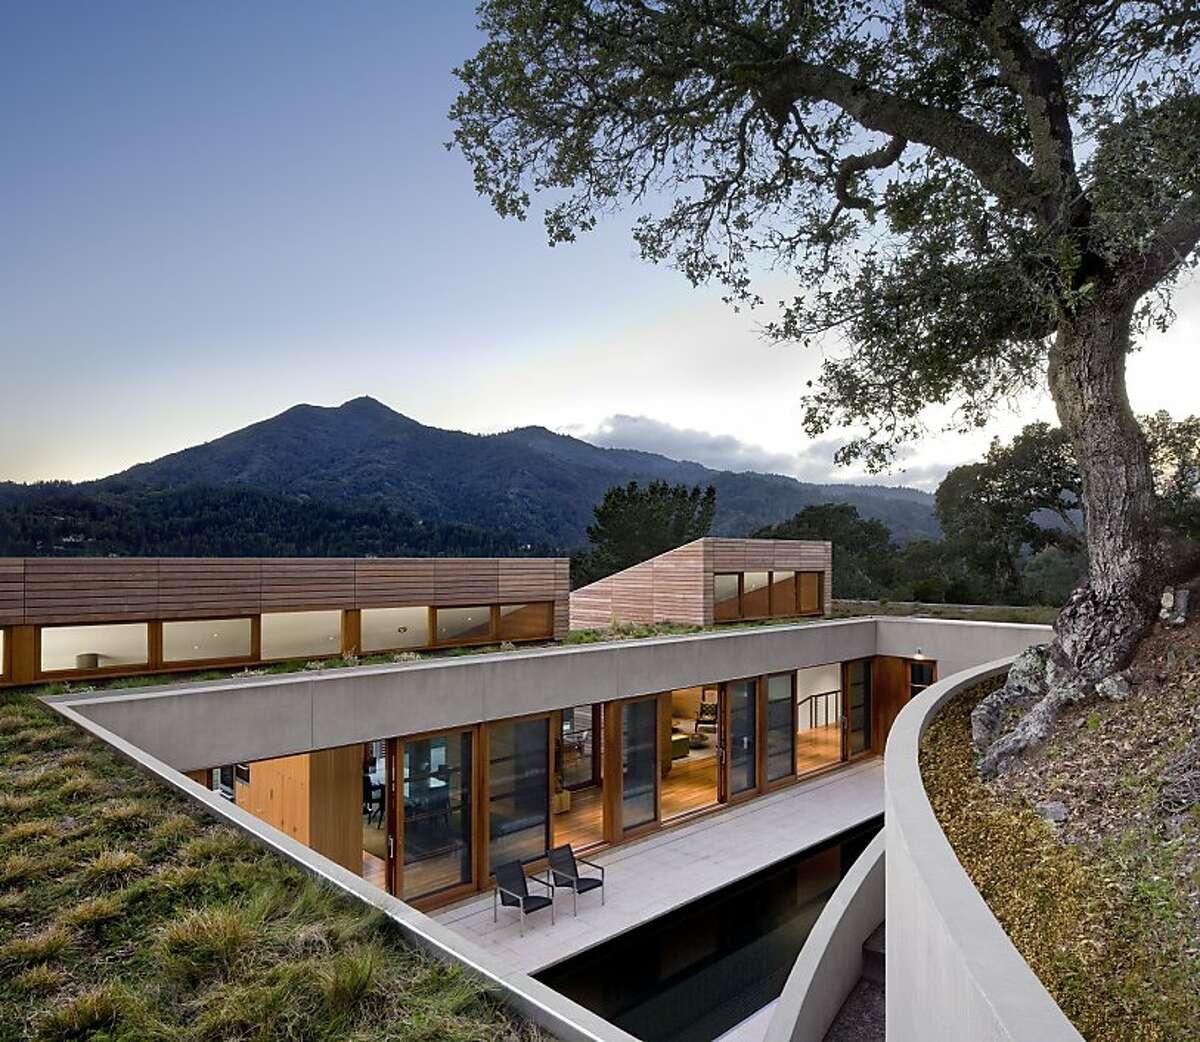 Hillside Residence by Turnbull Griffin Haesloop Architects